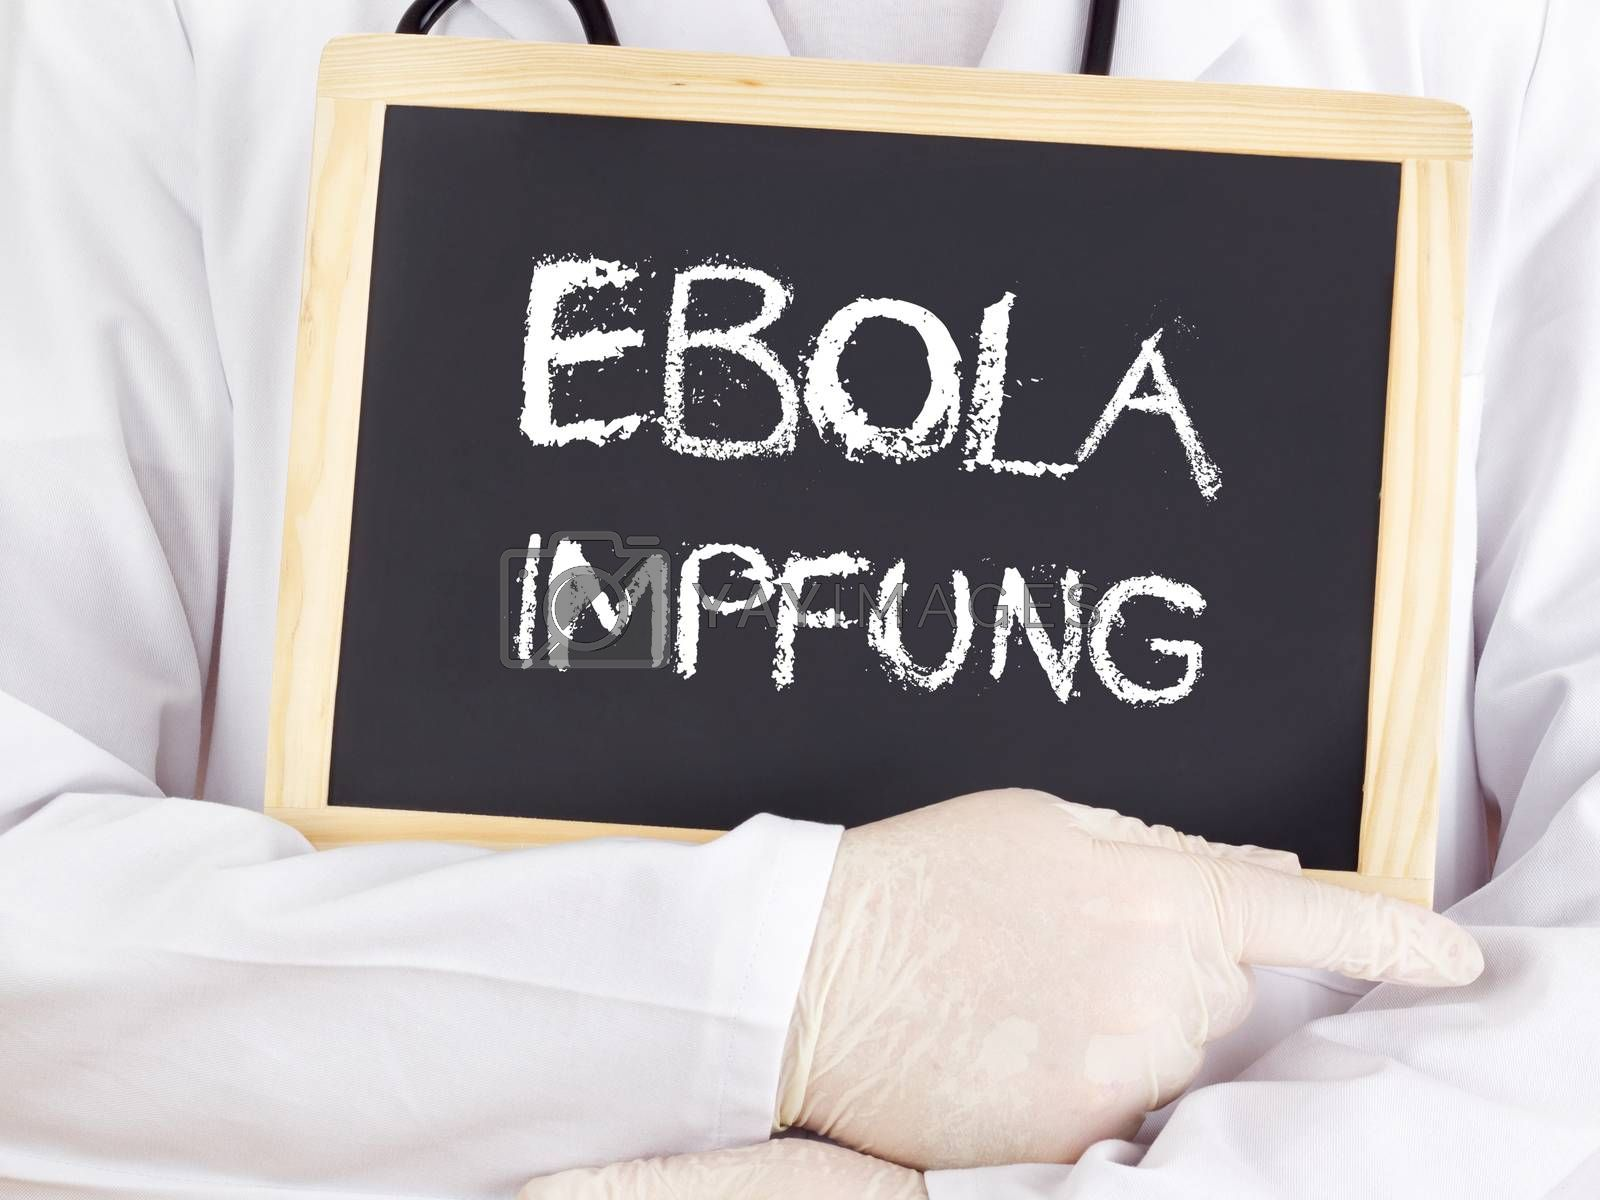 Doctor shows information: Ebola immunization in german